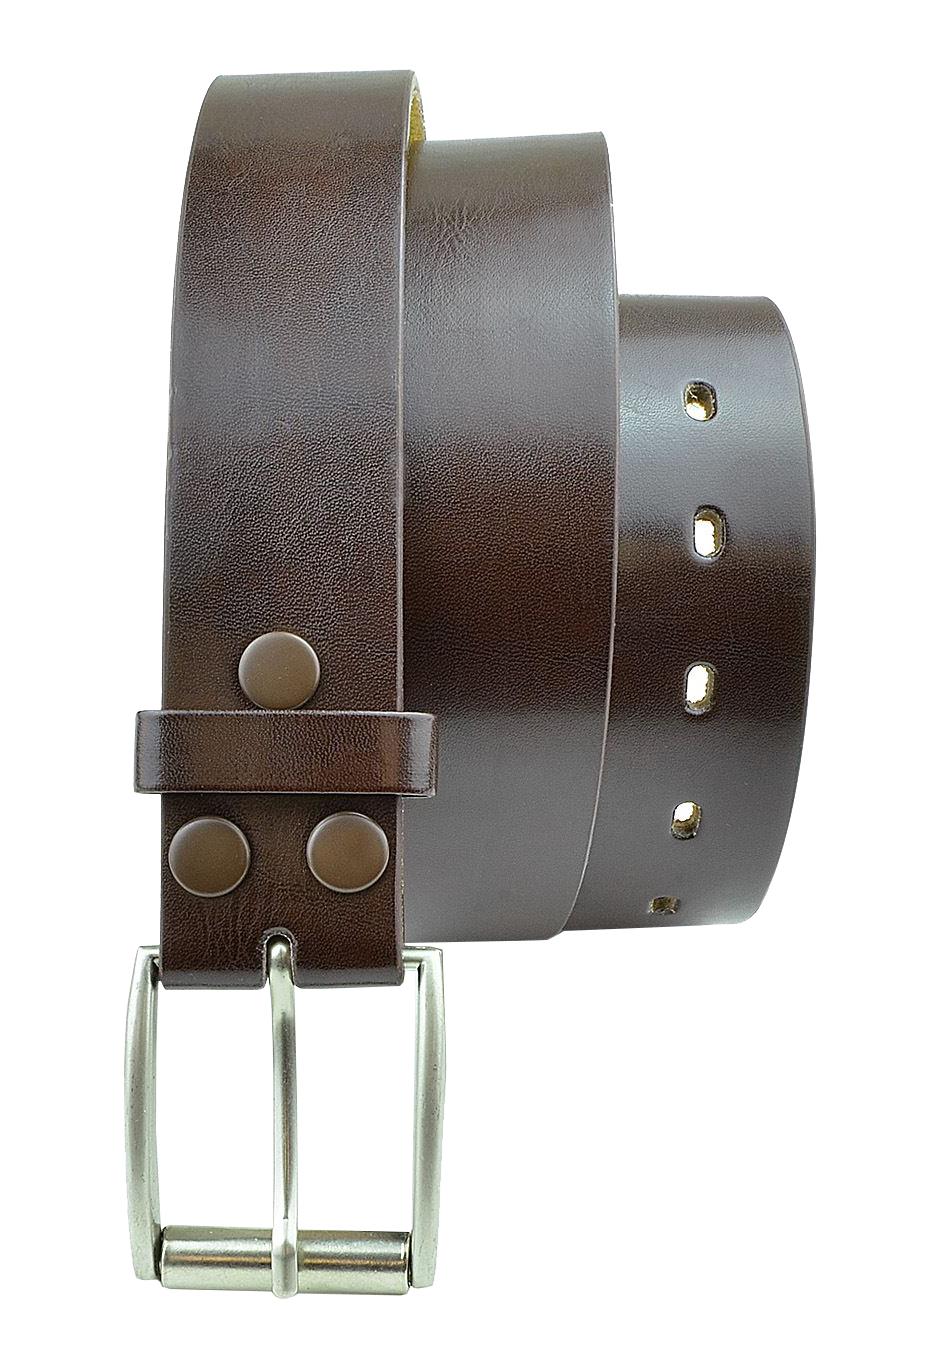 Moda Di Raza- Men's Belt - Dress Belt - Silver Polished Square Buckle - Single Prong Buckle - Brown/XL